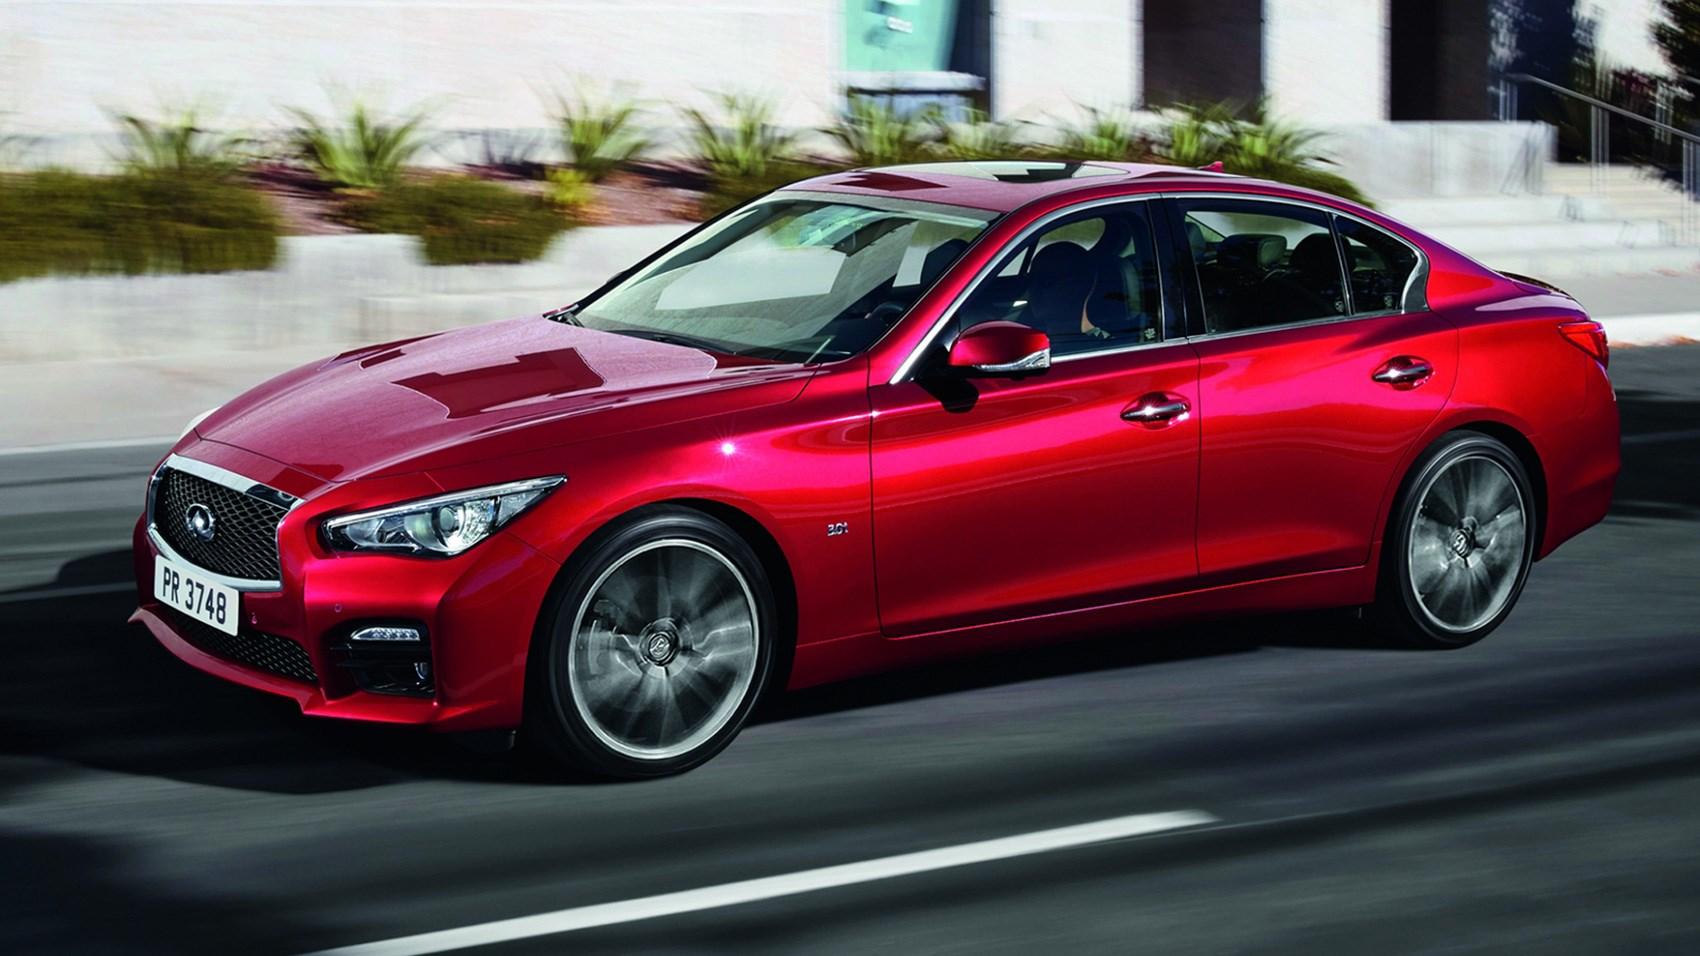 0 Down Lease Deals >> Infiniti Q50 3.0 Sport Tech (2017) review | CAR Magazine